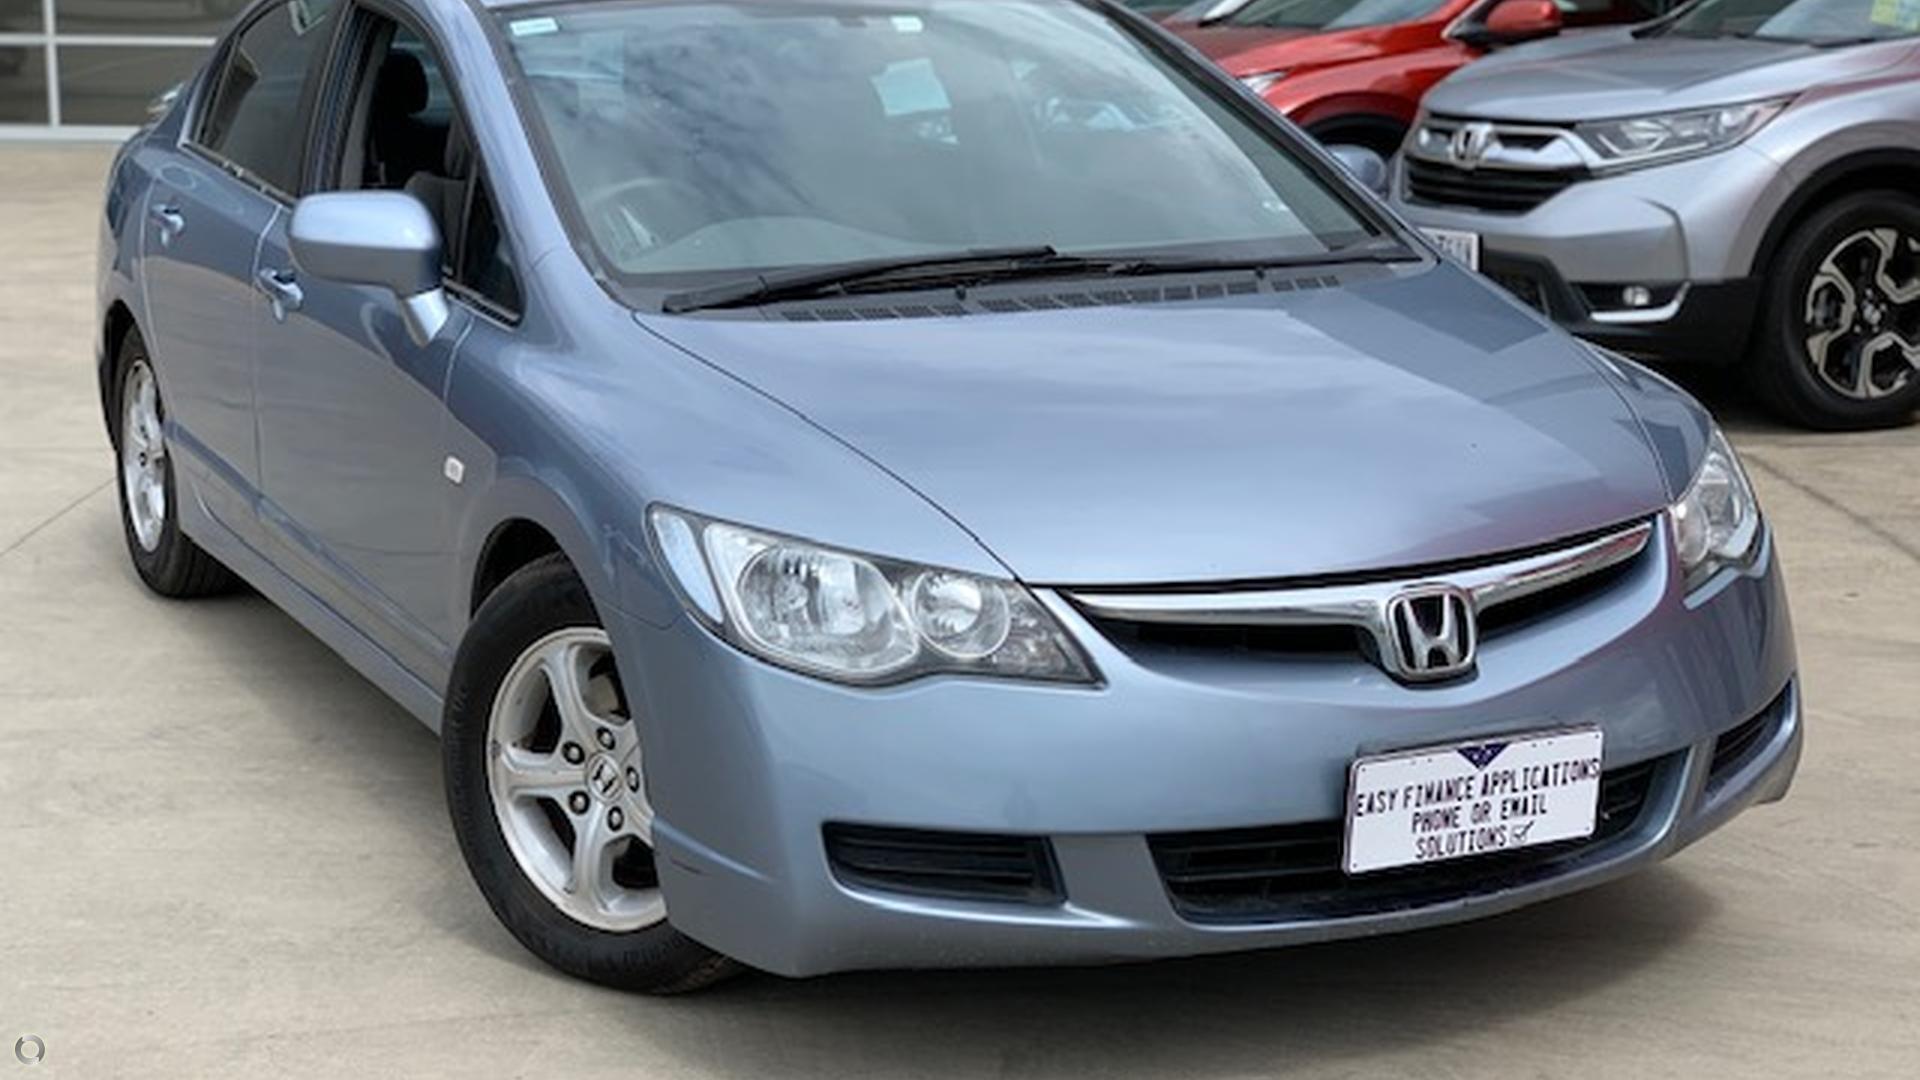 2006 Honda Civic VTi-L 8th Gen